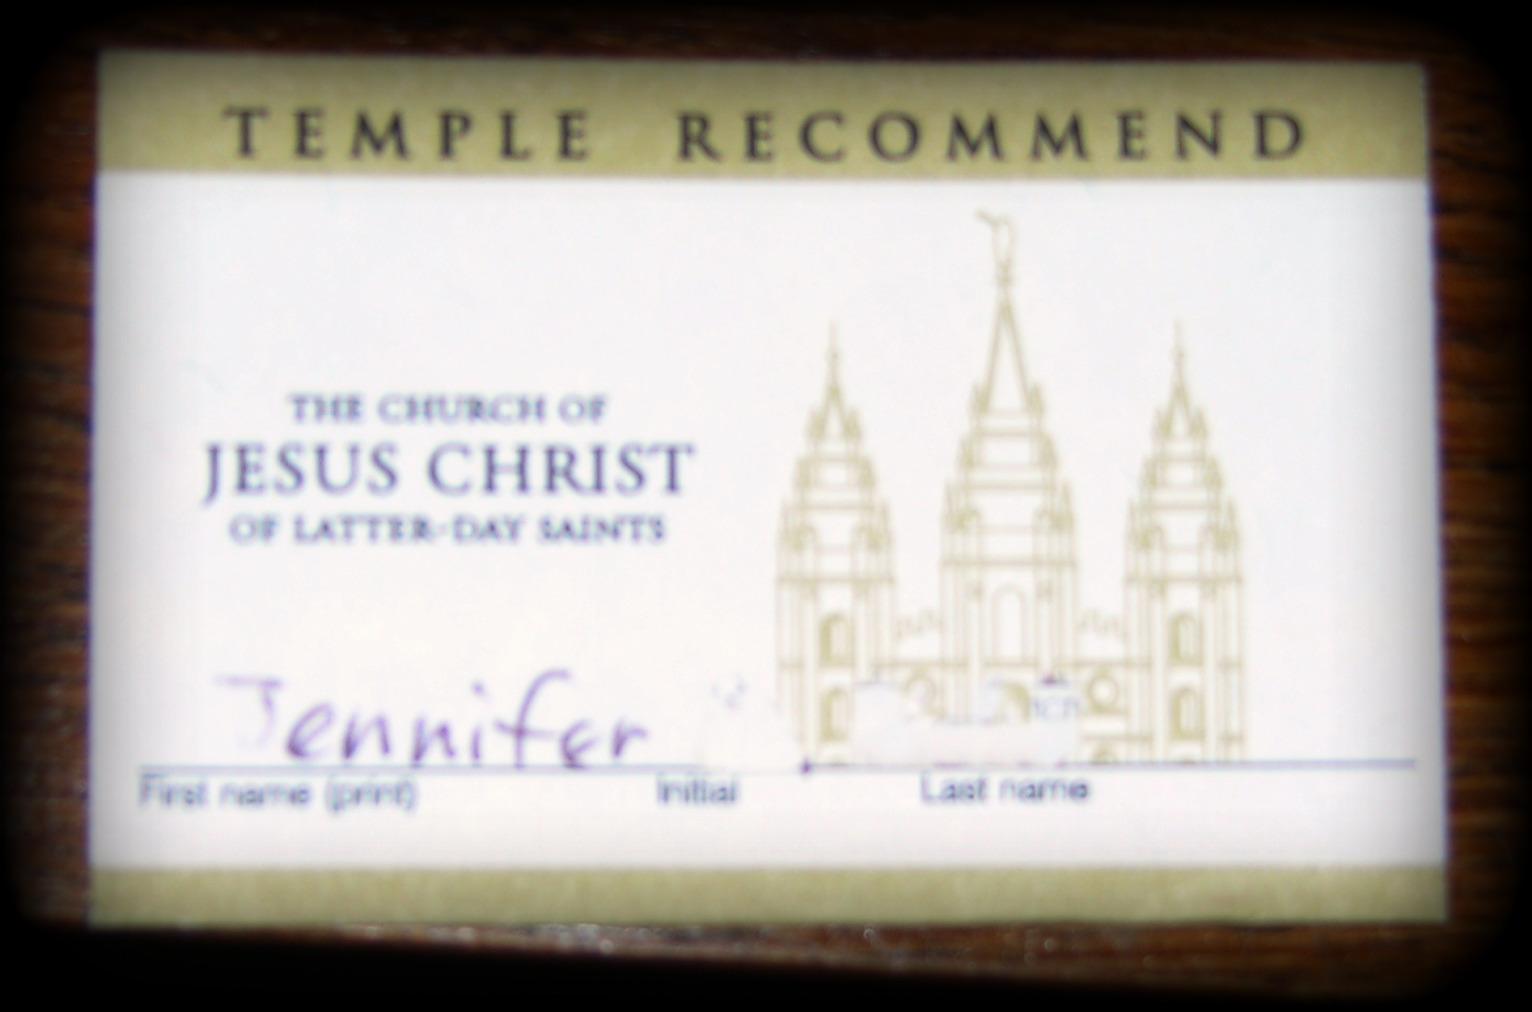 http://1.bp.blogspot.com/_7M5r2wwX1Eo/S6_SMbHKCEI/AAAAAAAAAEs/FOzEGefAaVg/s1600/Temple%2Brecommend.jpg